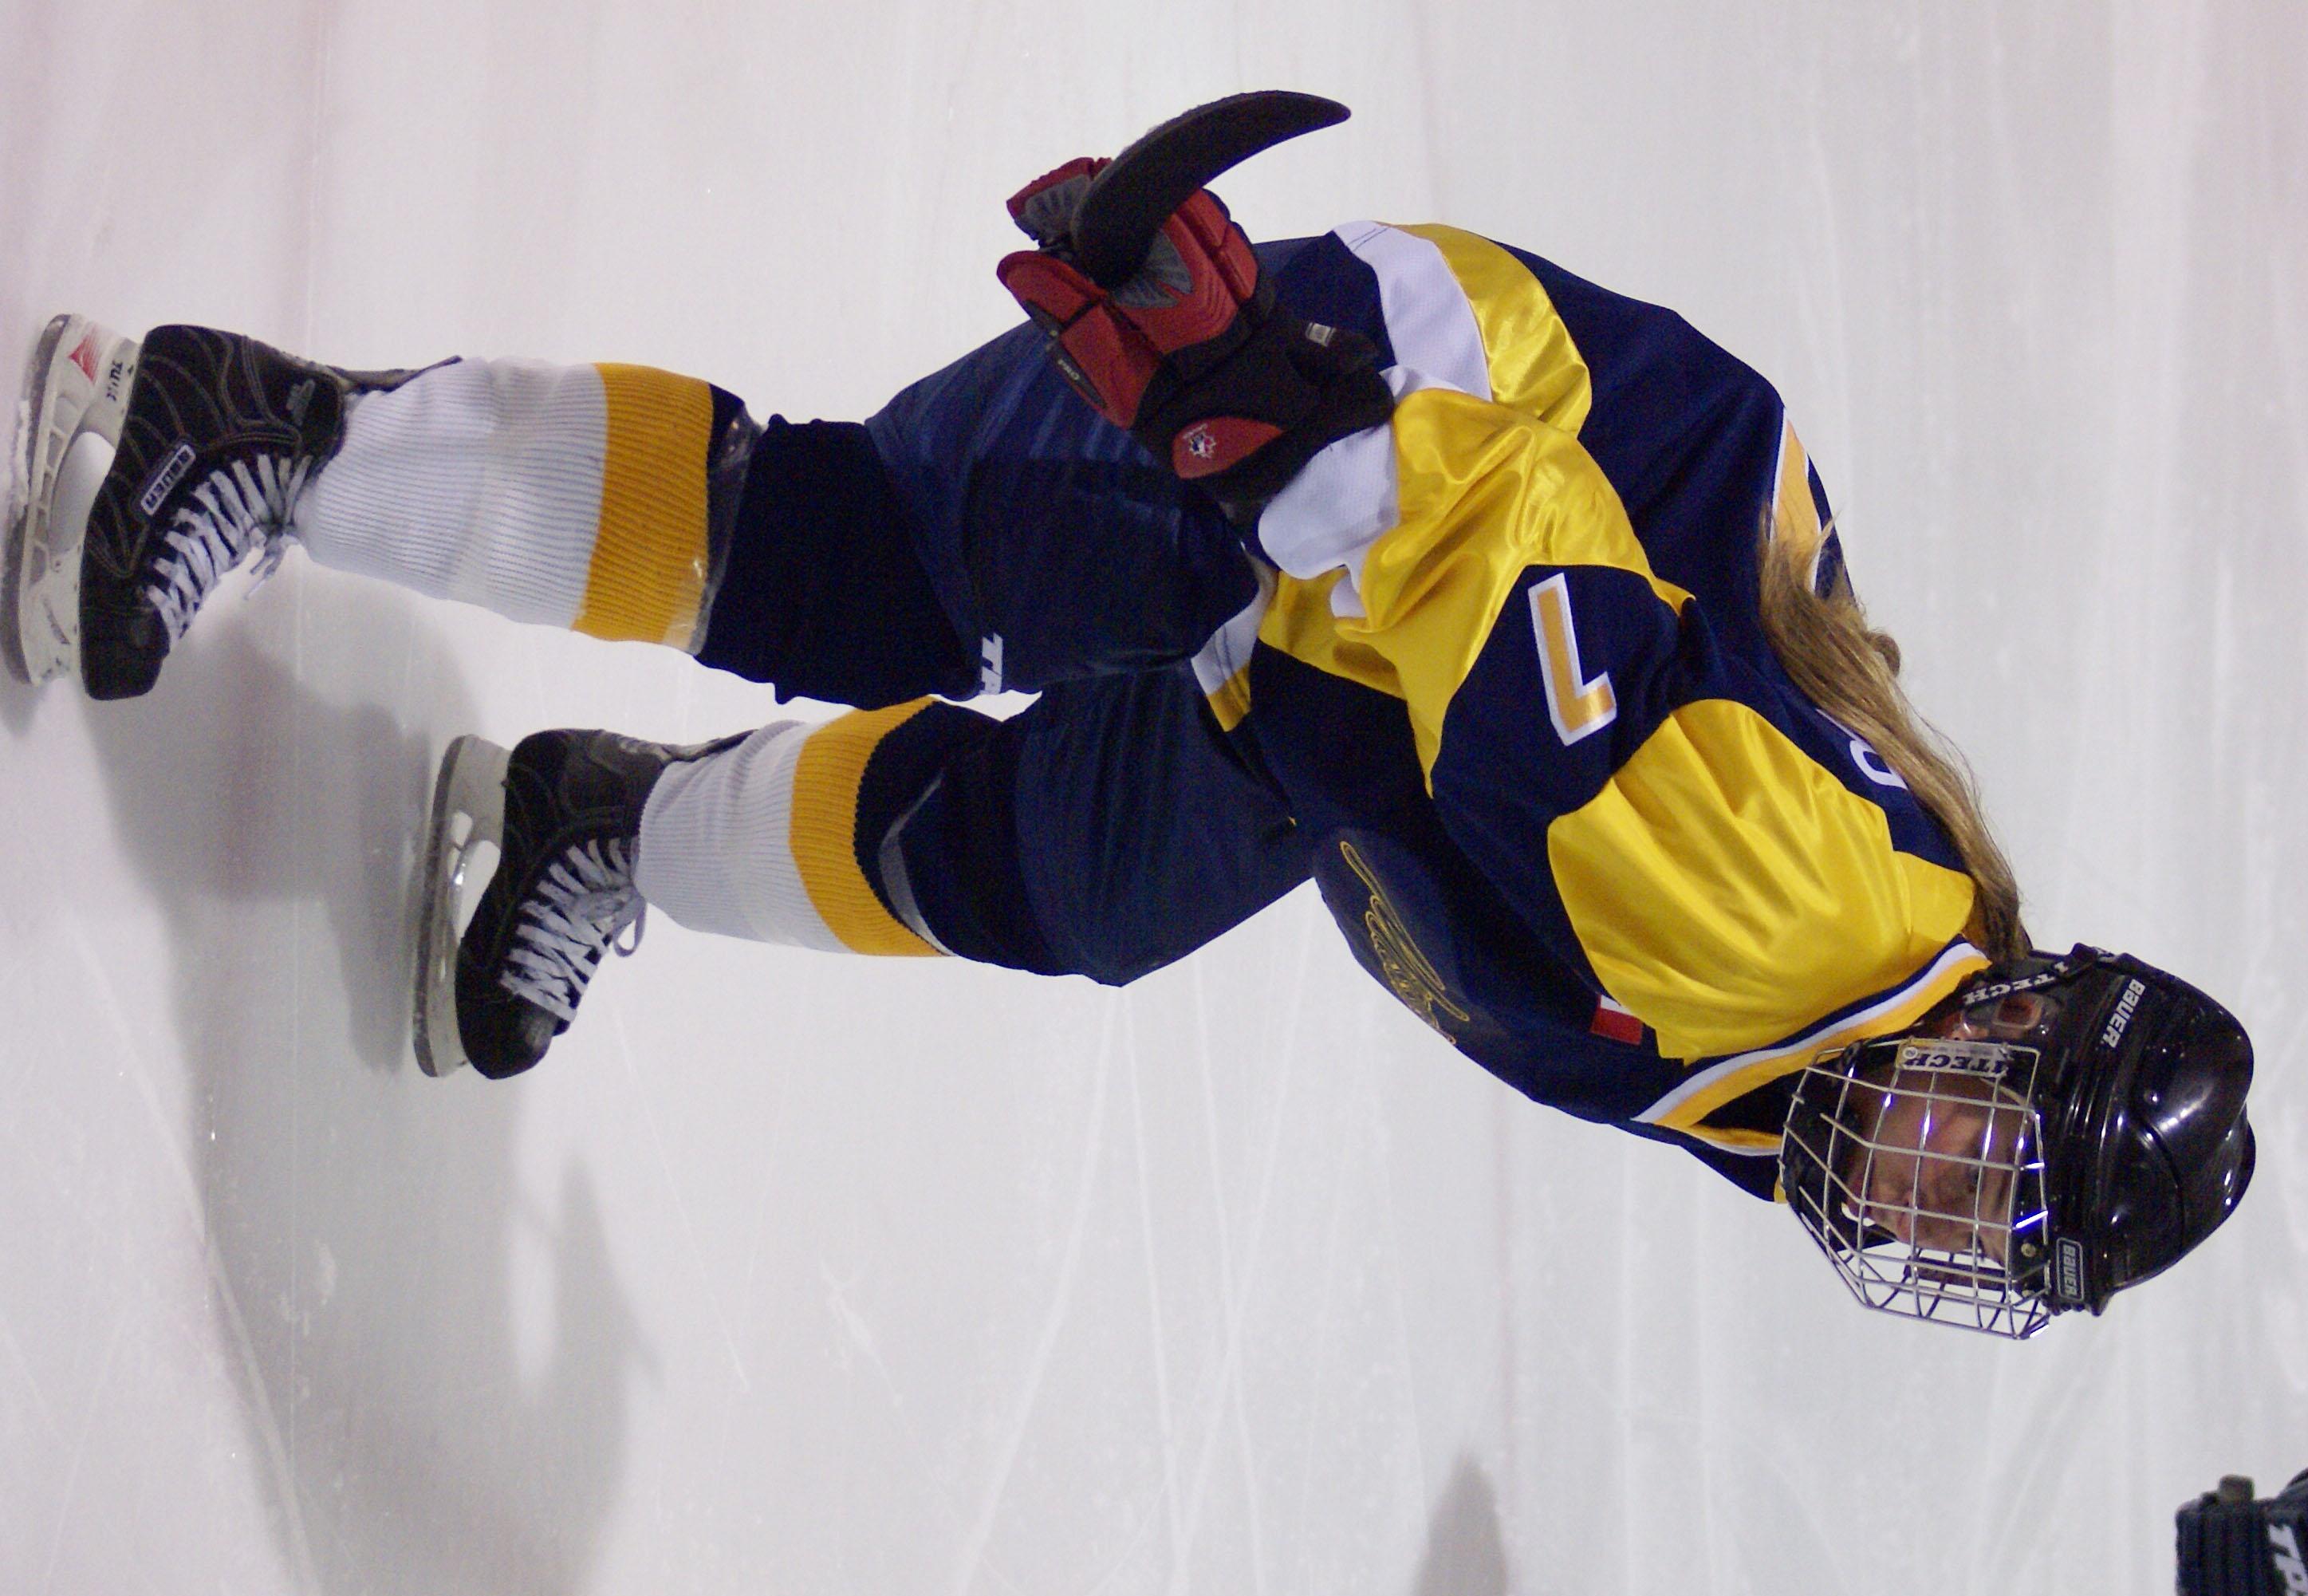 Noam Zylberman,Blair Brown Porno video Vika Ihnatenko UKR,Ice hockey